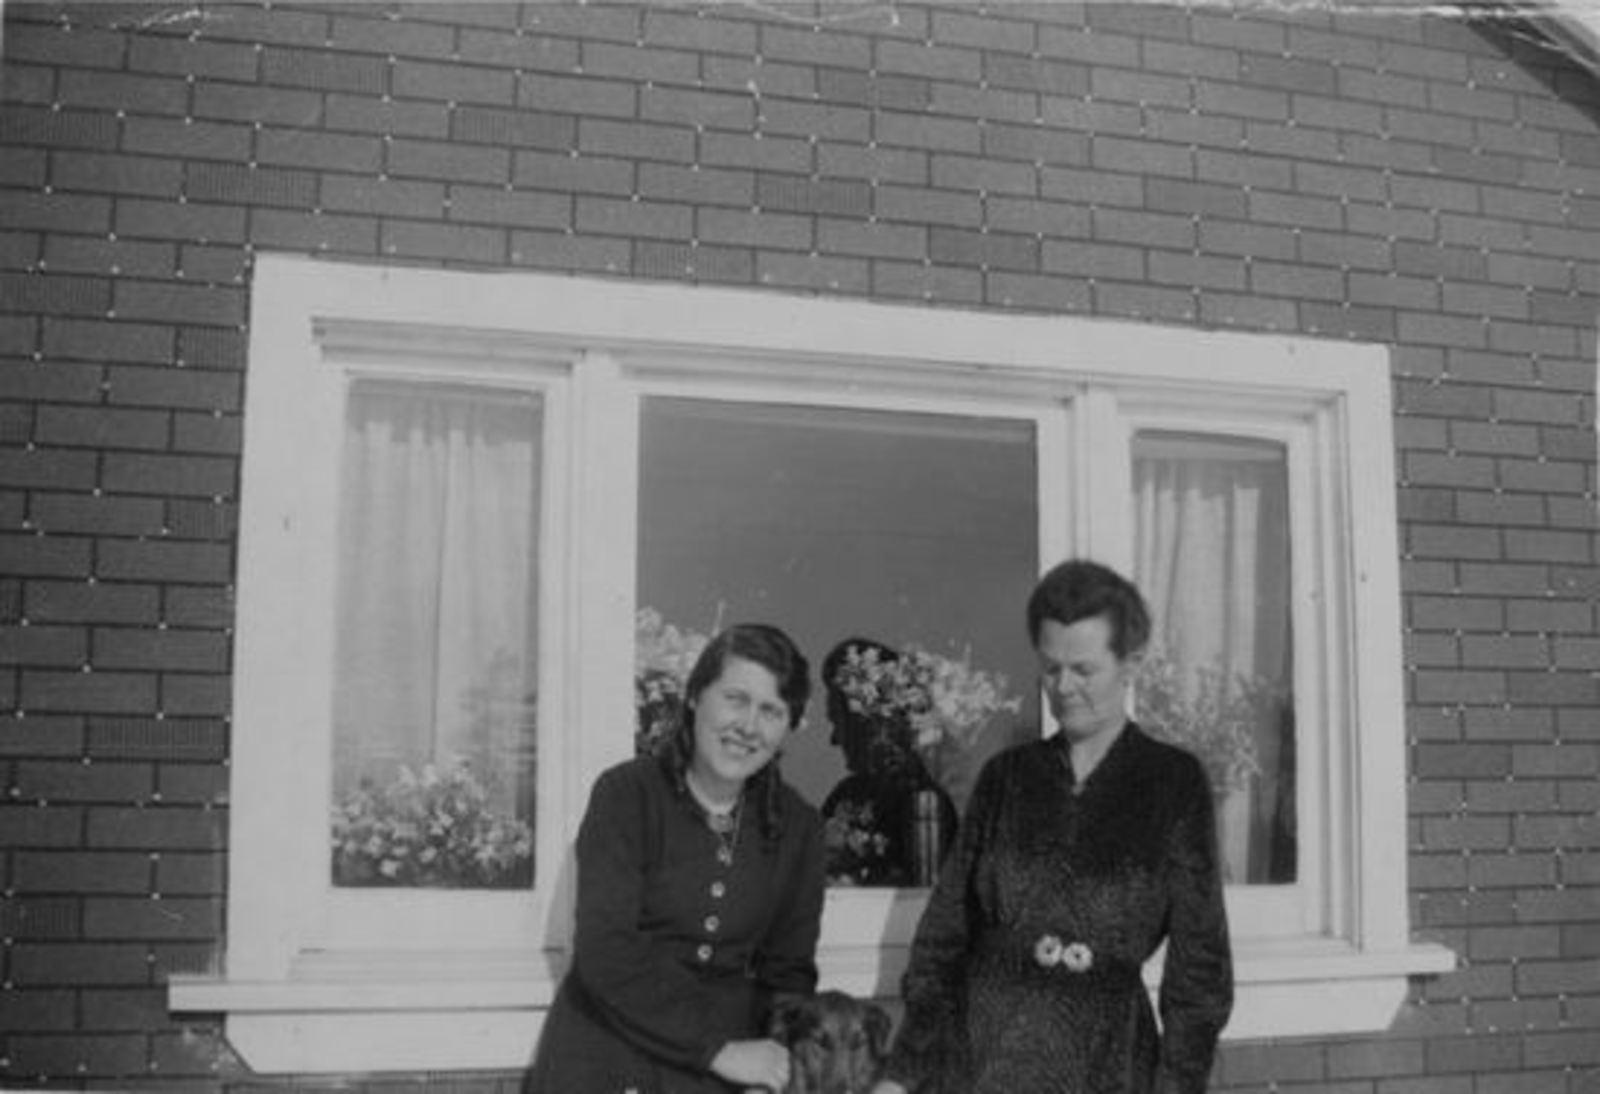 <b>ZOEKPLAATJE:</b>Broersma-v Vuren Bartje 1951 Onbekend 36  Canadeze familie